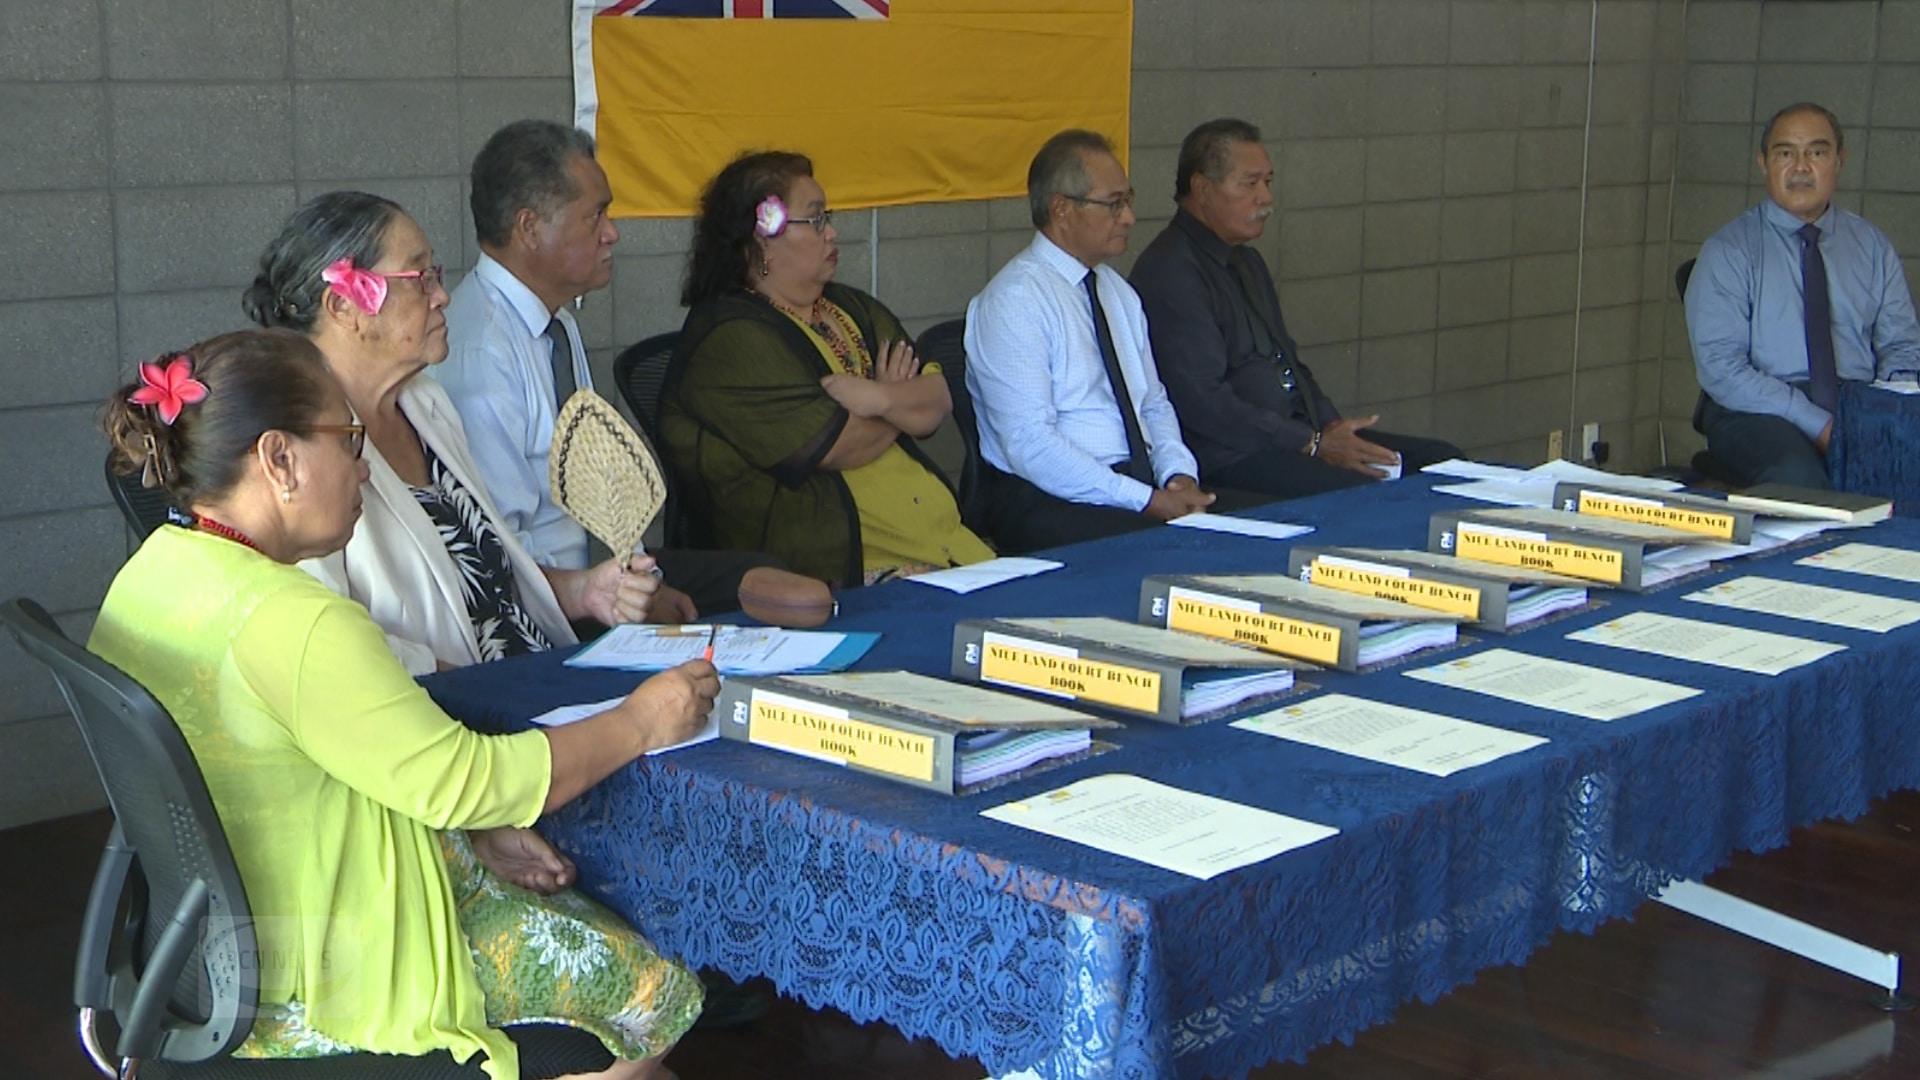 Six Commissioners of the High Court of Niue have been sworn in.  They are Tutuli Heka, Florence Maureen Vilitama Melekitama, Tom Tamatoa Misikea, Minemaligi Pulu, Deve Kolose Talagi and Beckys Christmas…